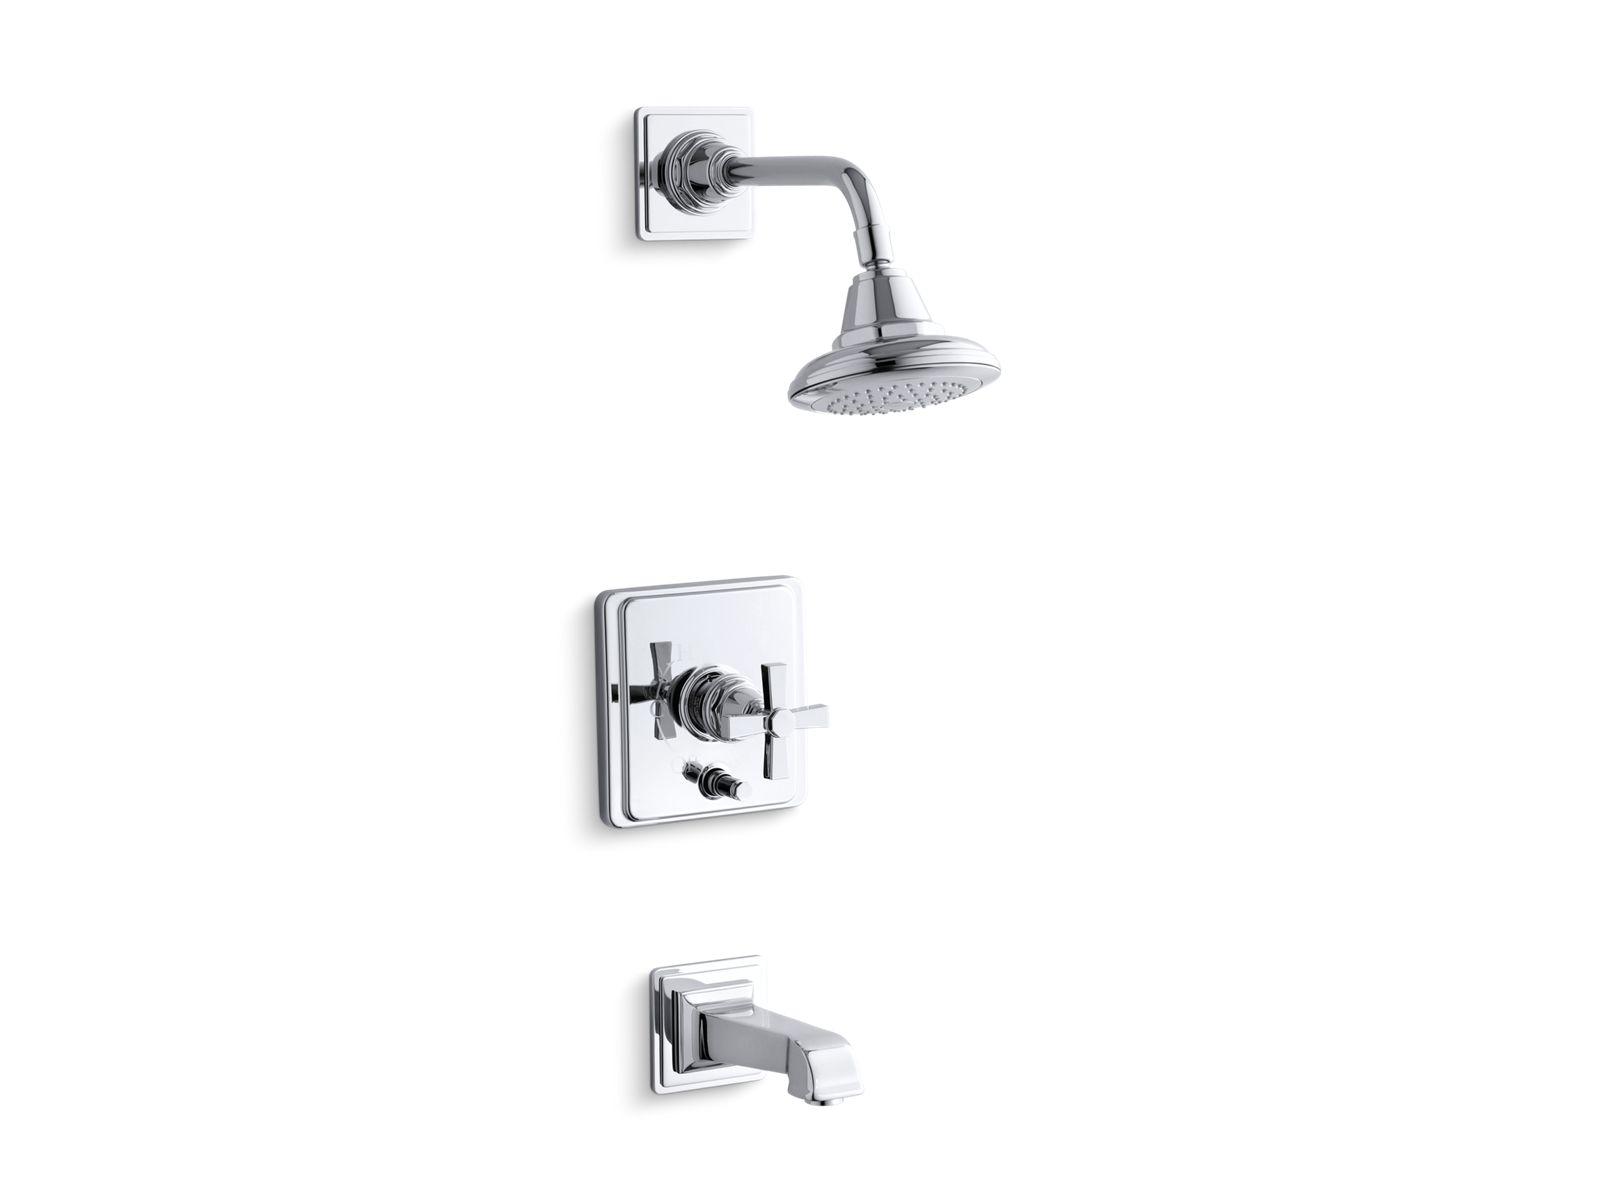 k t13133 3a pinstripe bath and shower faucet trim with pure design kohler